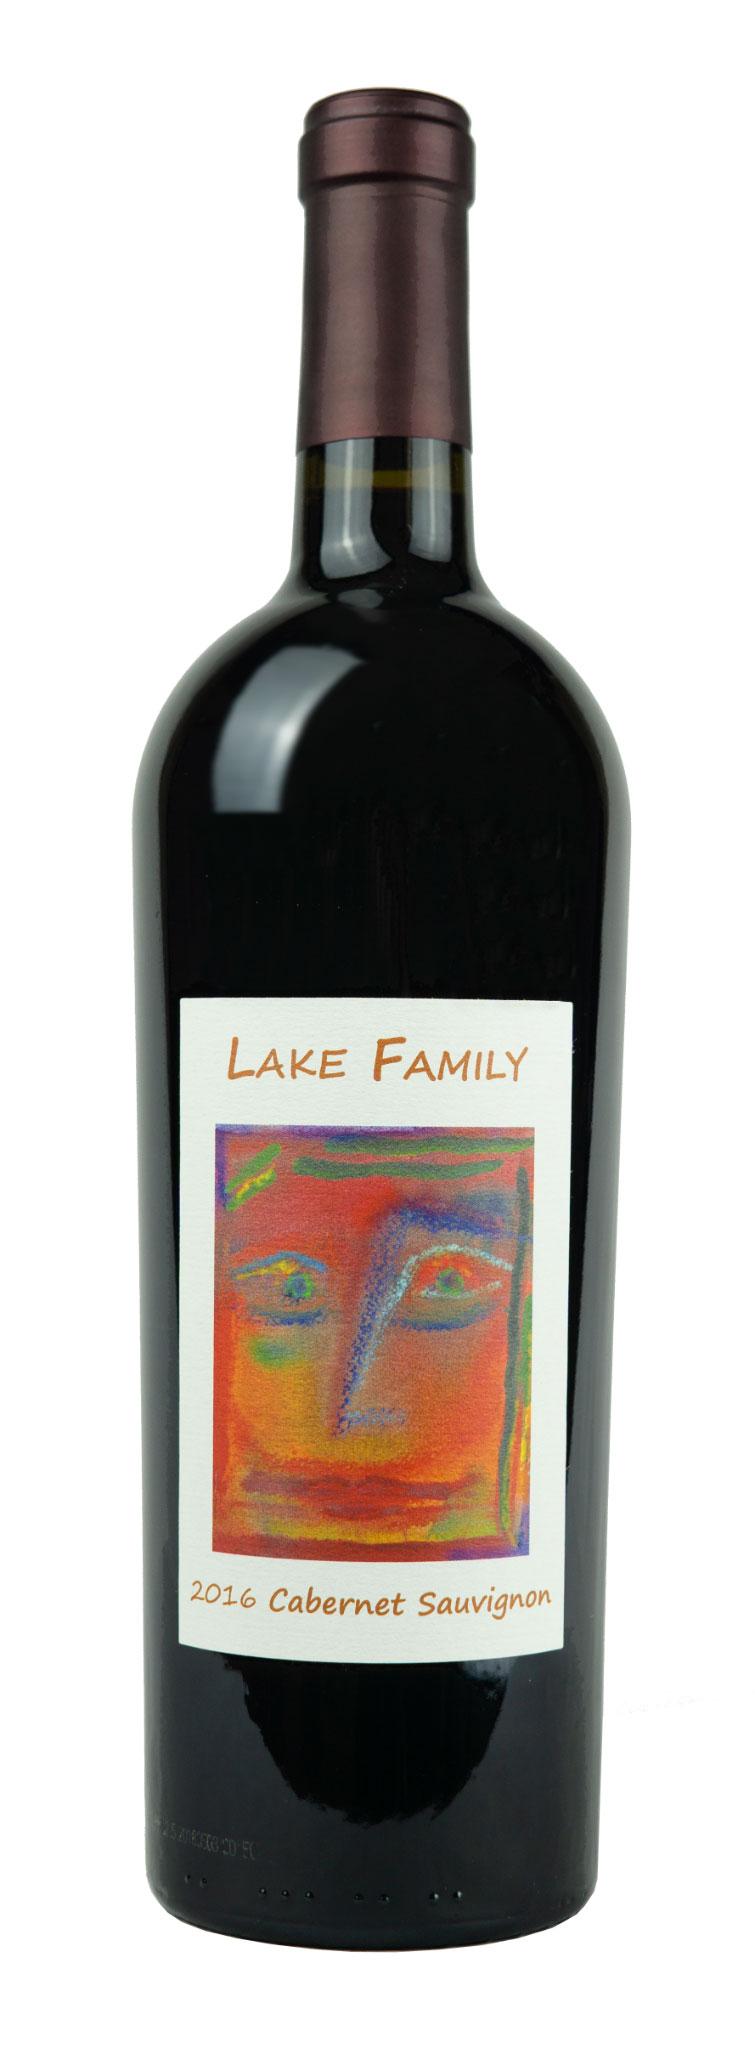 spann-vineyards-lake-family-2016-cabernet-sauvignon